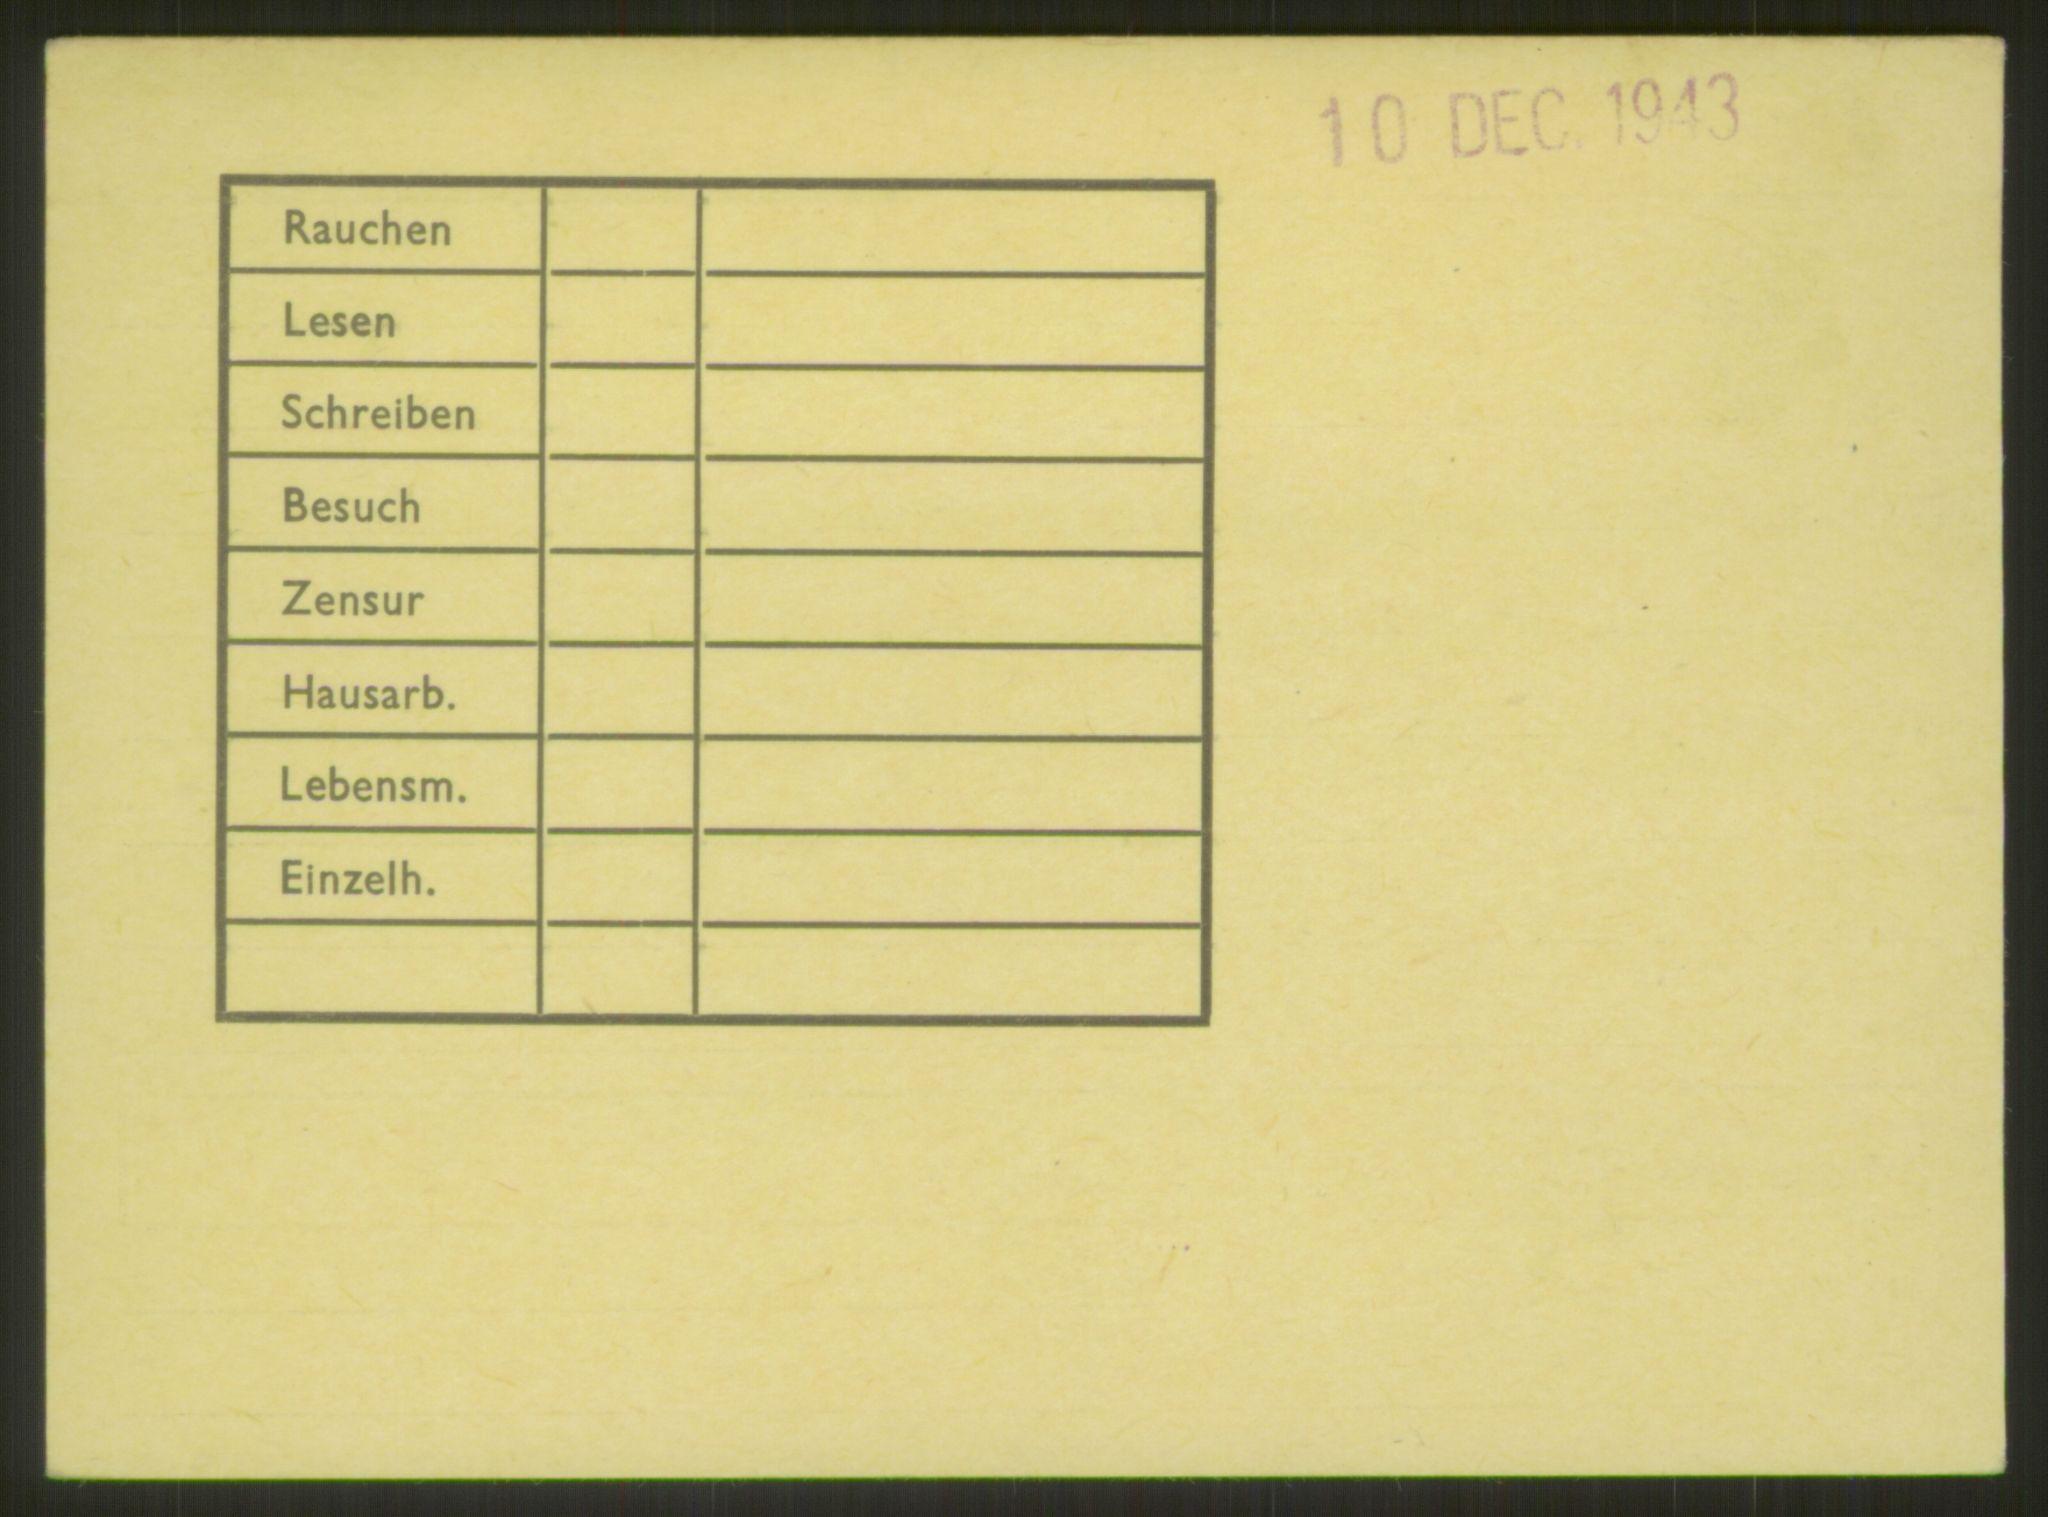 RA, Befehlshaber der Sicherheitspolizei und des SD, E/Ea/Eab/L0006: Register over norske fanger i Møllergata 19 ordnet etter fangenummer: 5500-6299, 1940-1945